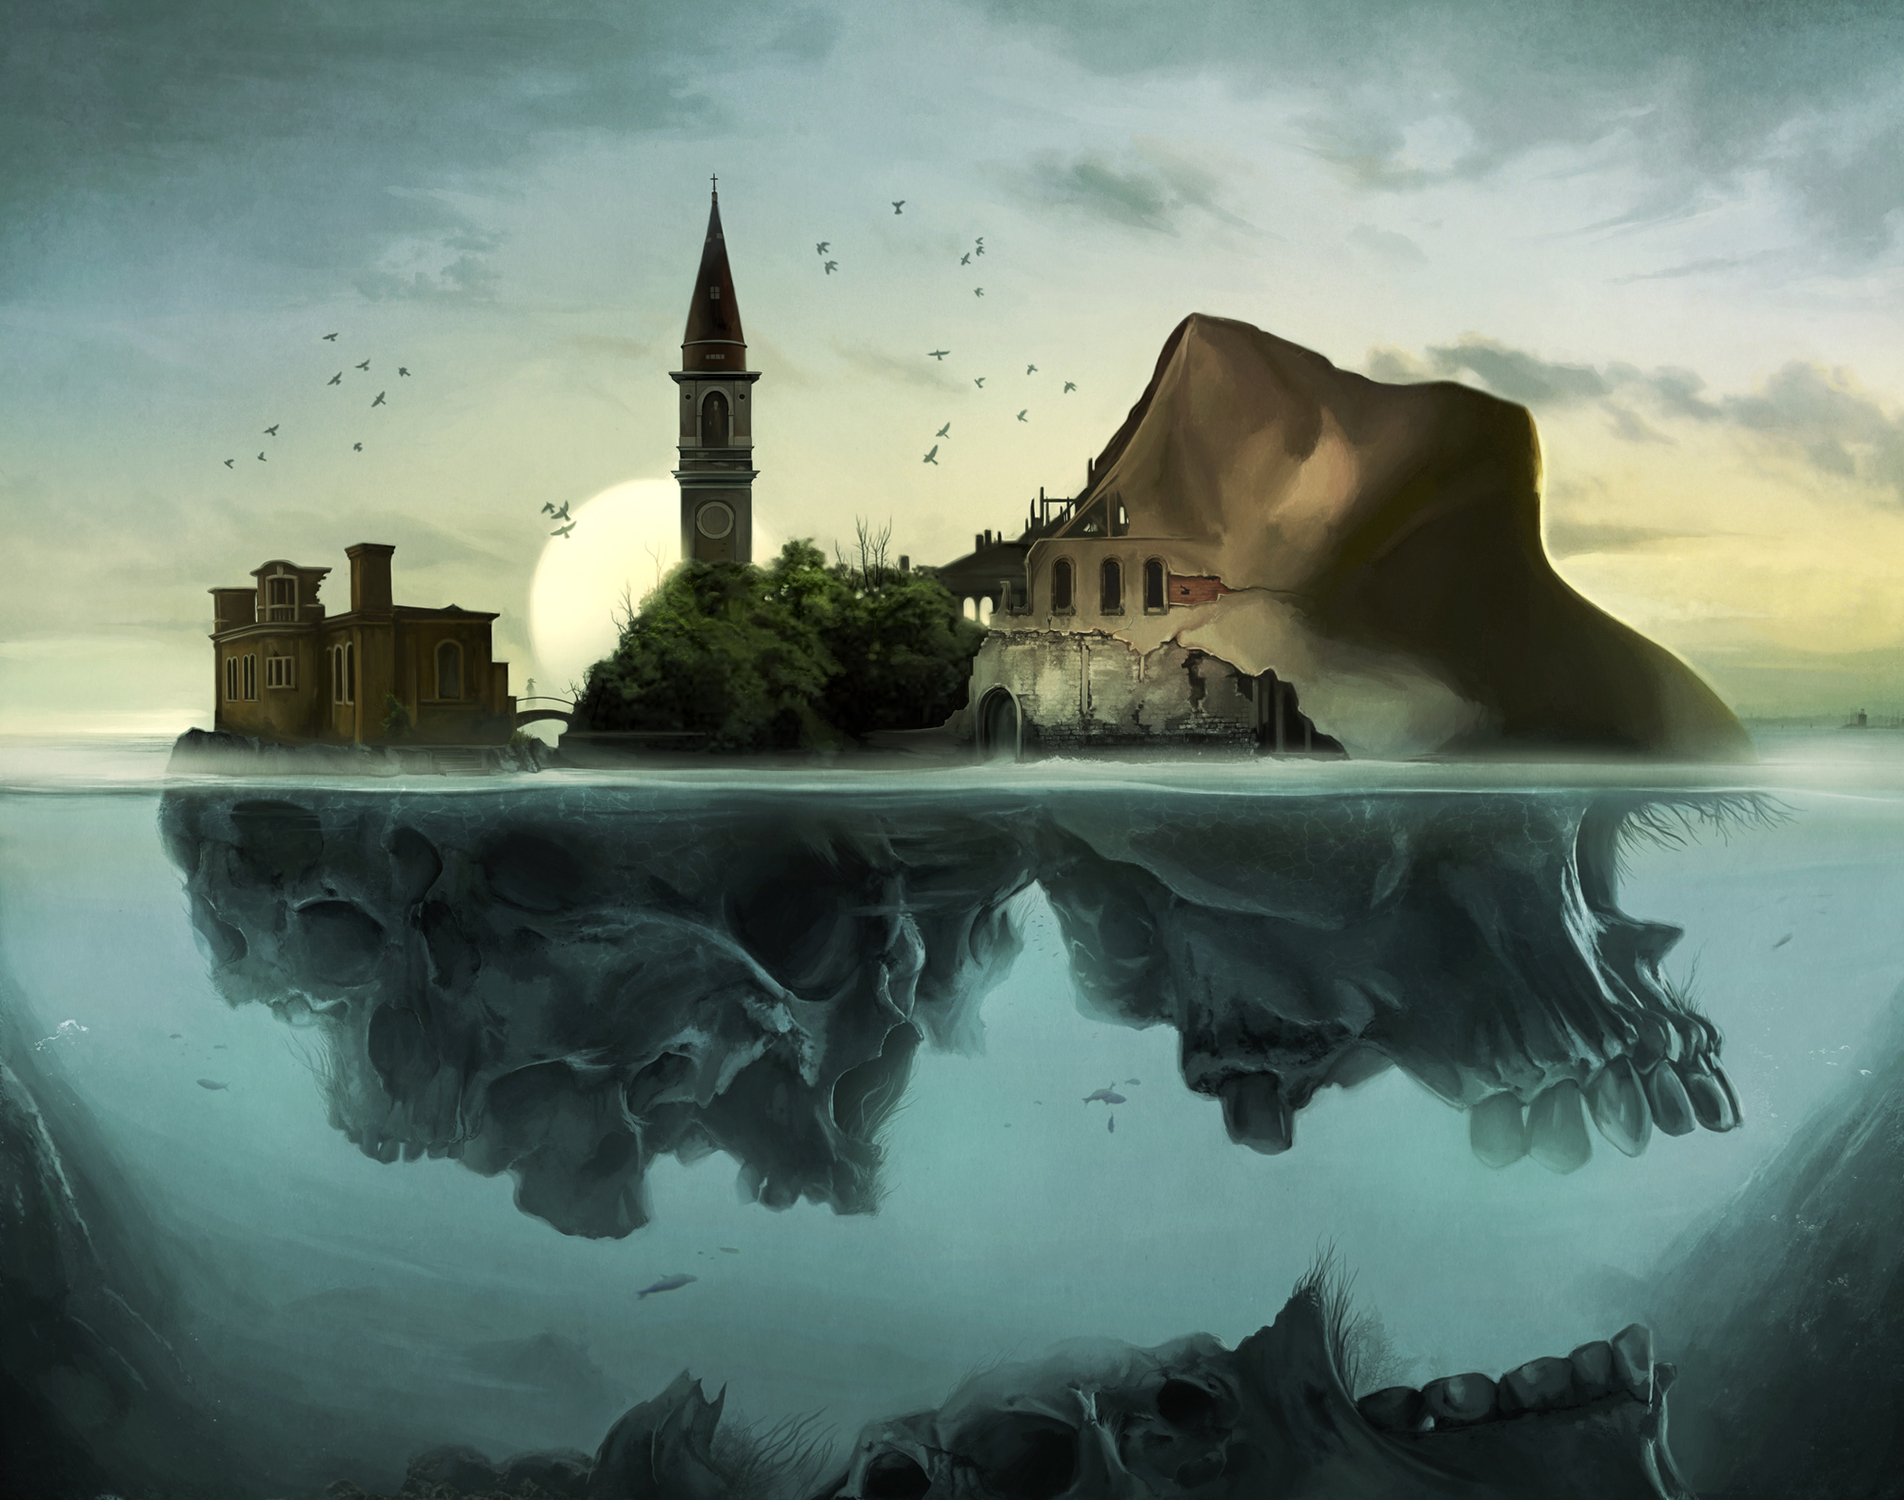 Poveglia Island Artwork by David Seidman